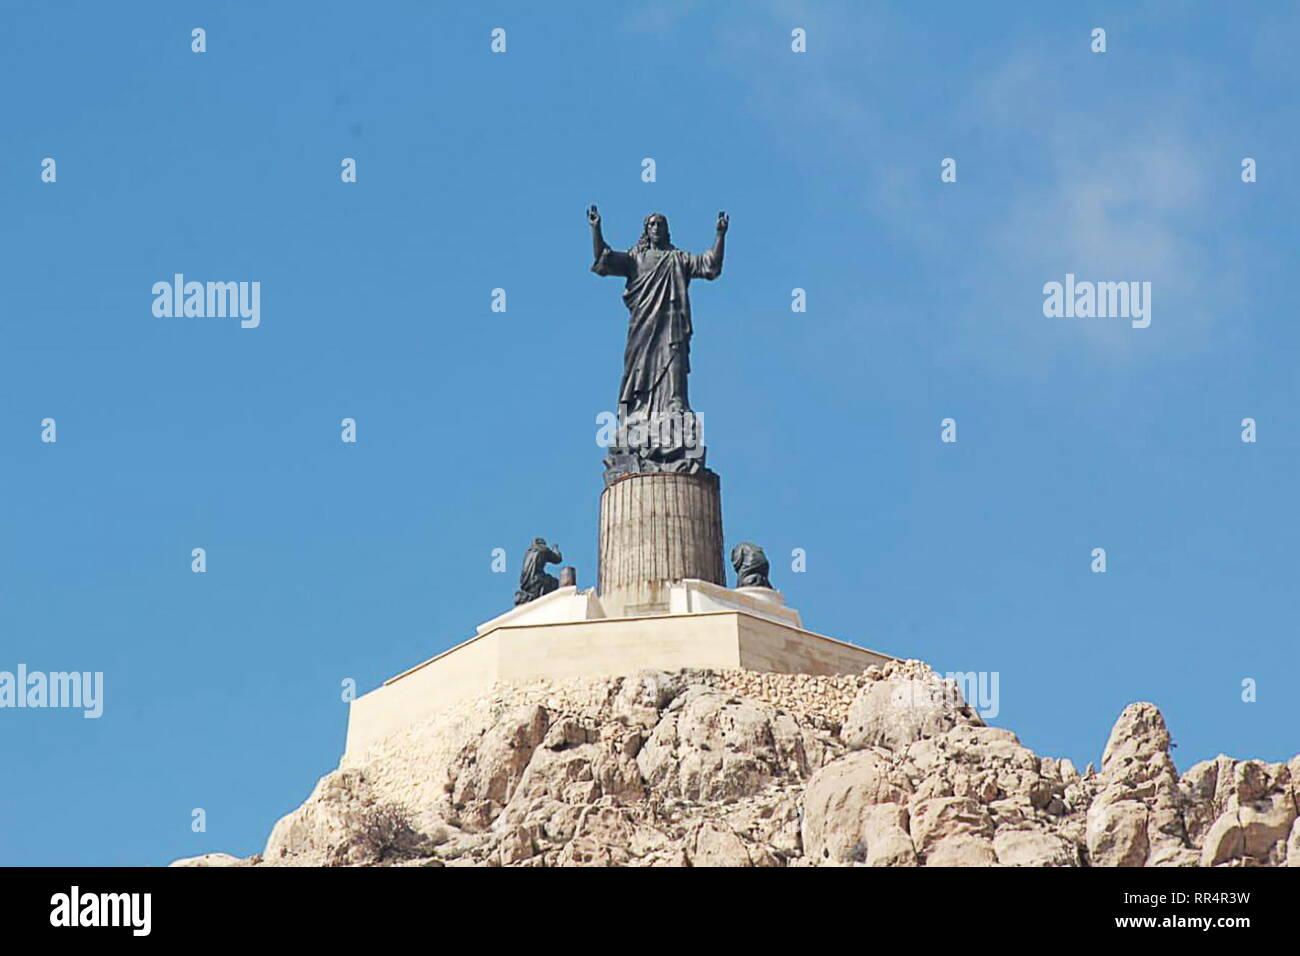 Saidnaya, Syria. 24th Feb, 2019. SAIDNAYA, SYRIA - FEBRUARY 24, 2019: A view of the 32-metre Statue of Jesus near the Cherubim Monastery. Konstantin Machulsky/TASS Credit: ITAR-TASS News Agency/Alamy Live News - Stock Image